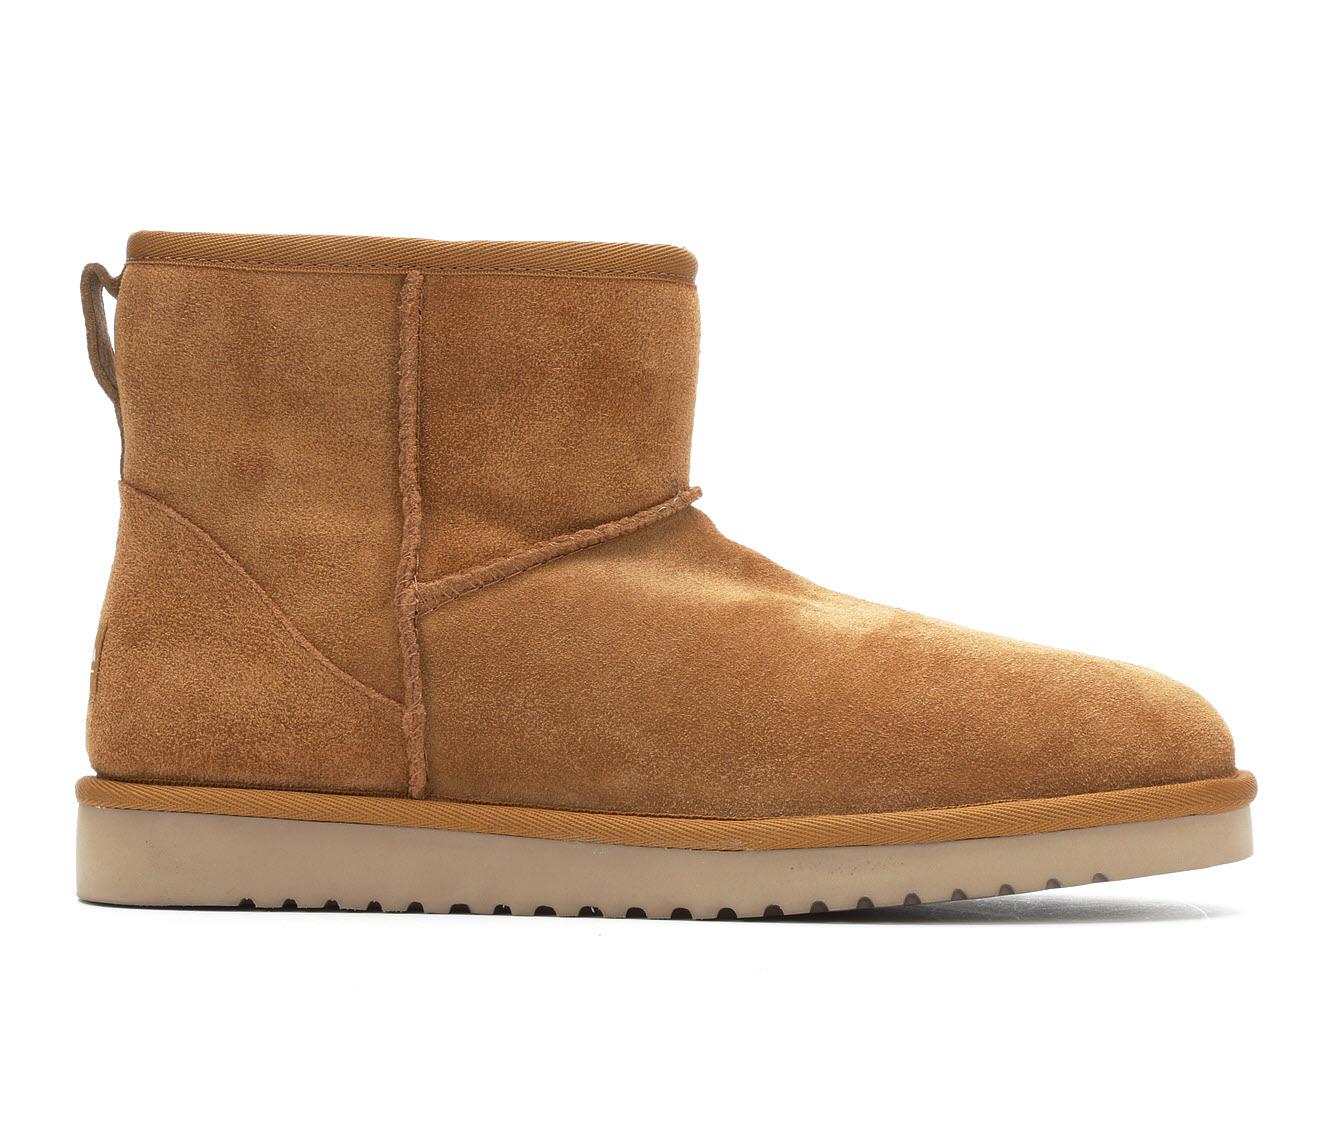 Koolaburra by UGG Burra Mini Men's Boots (Brown Suede)